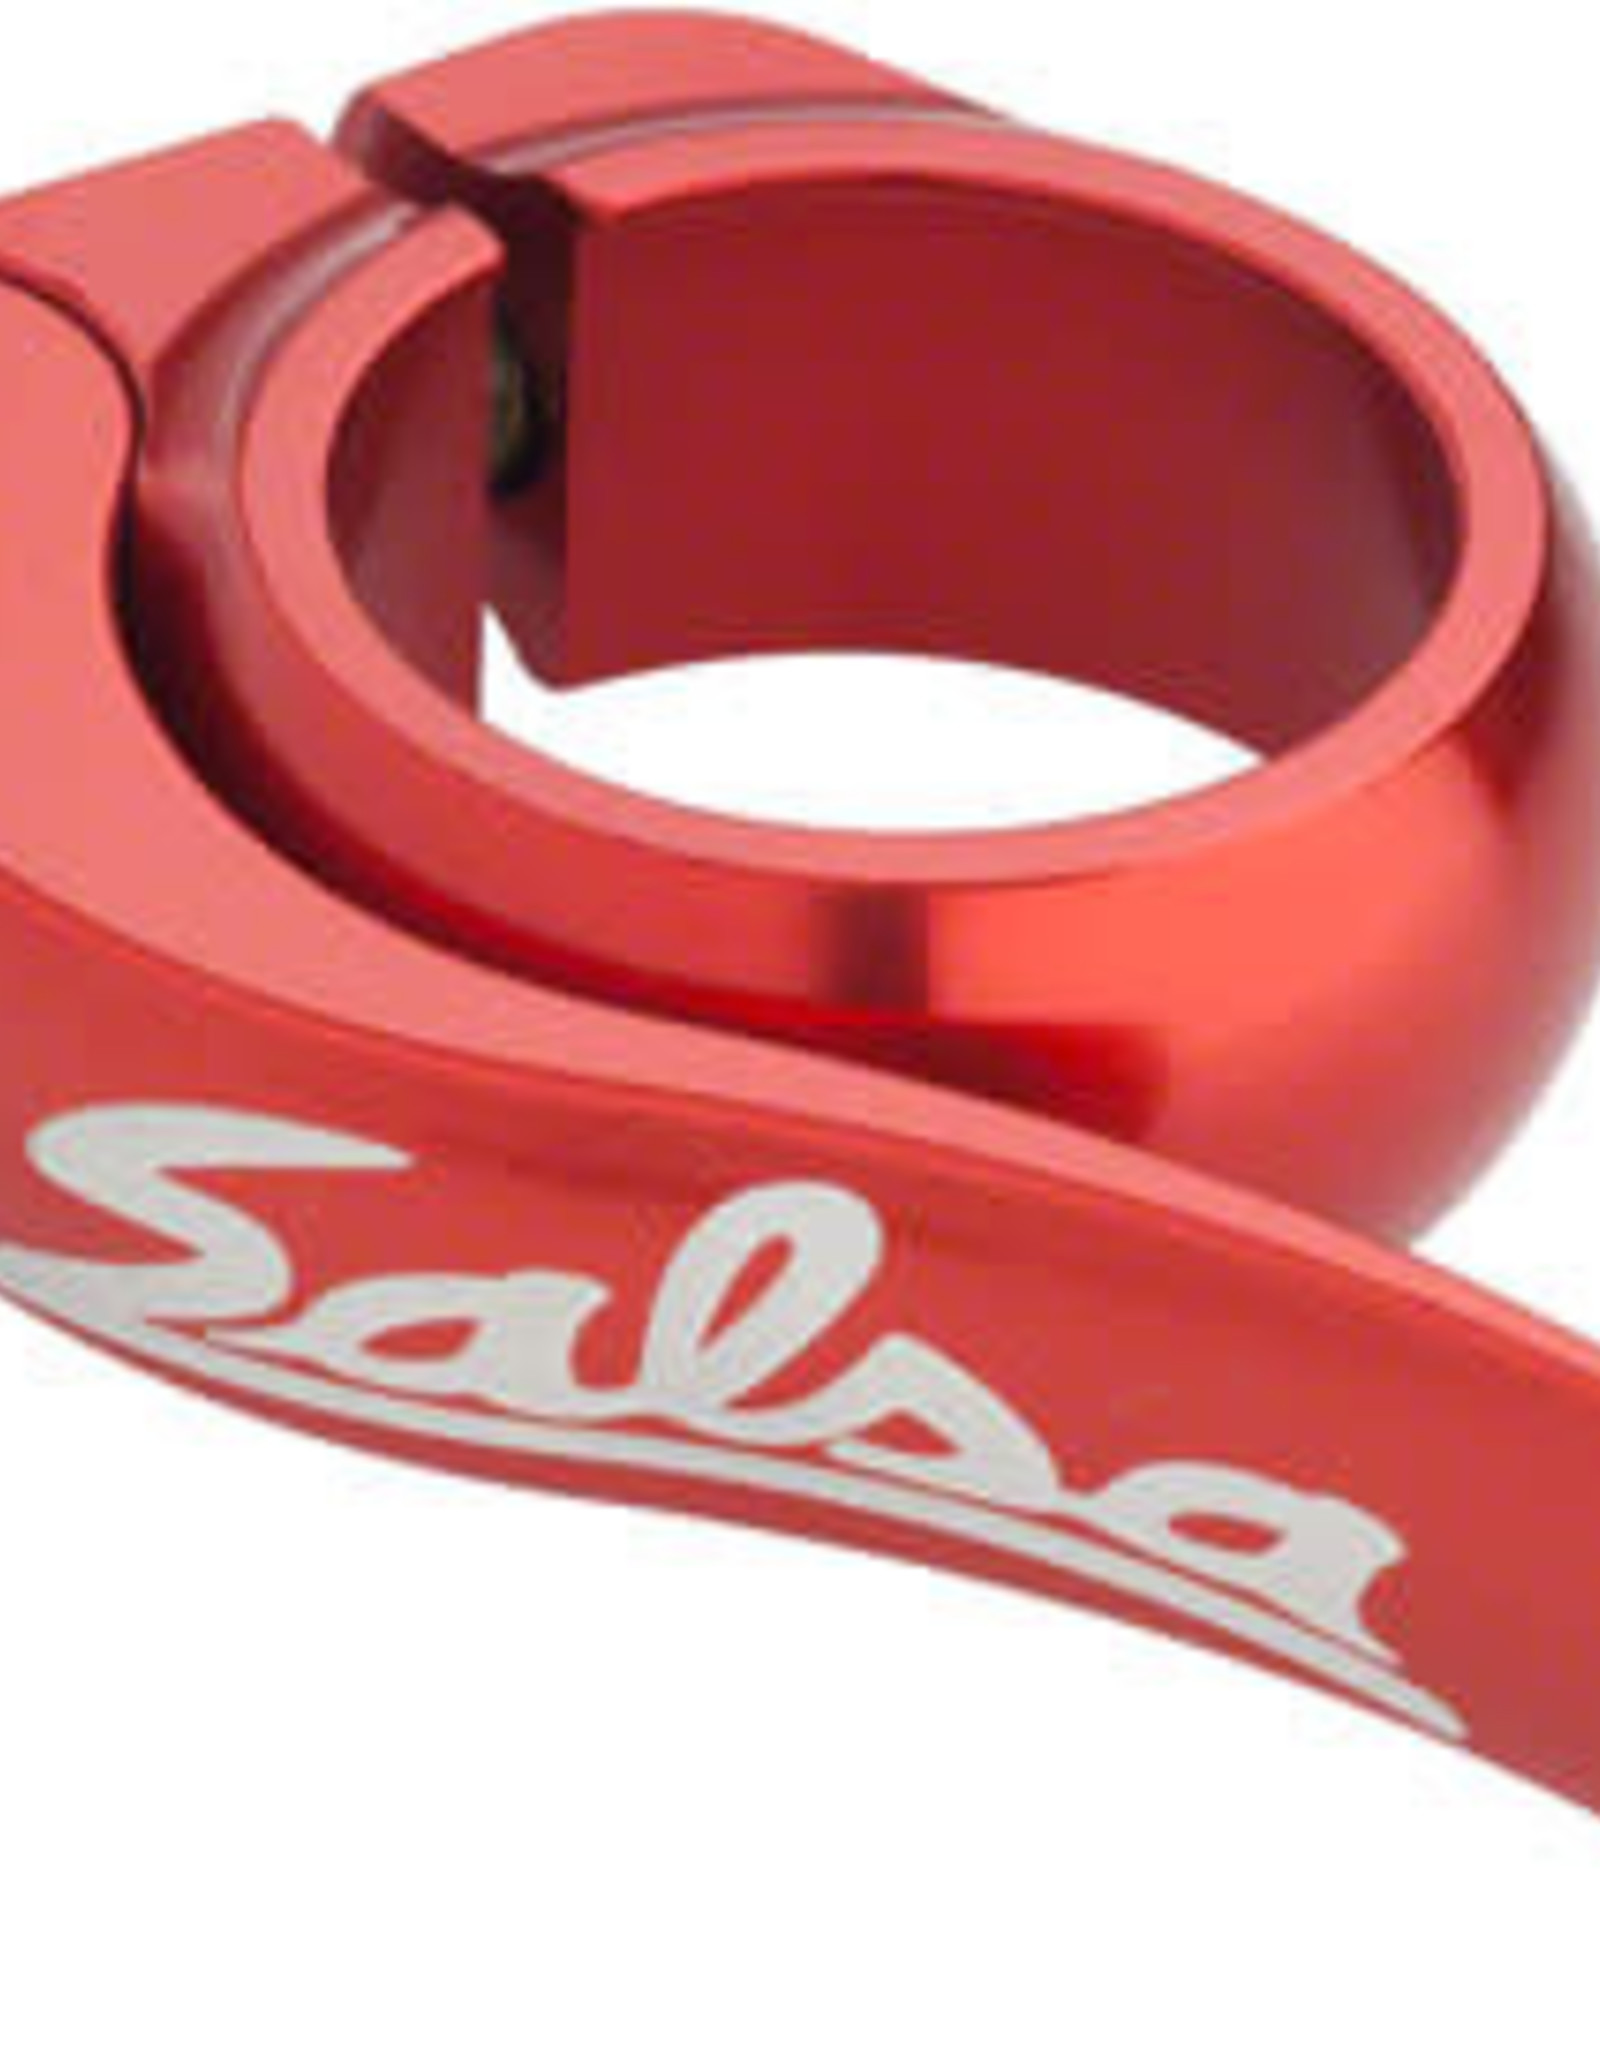 Salsa Flip-Lock Seat Collar 35.0 Red